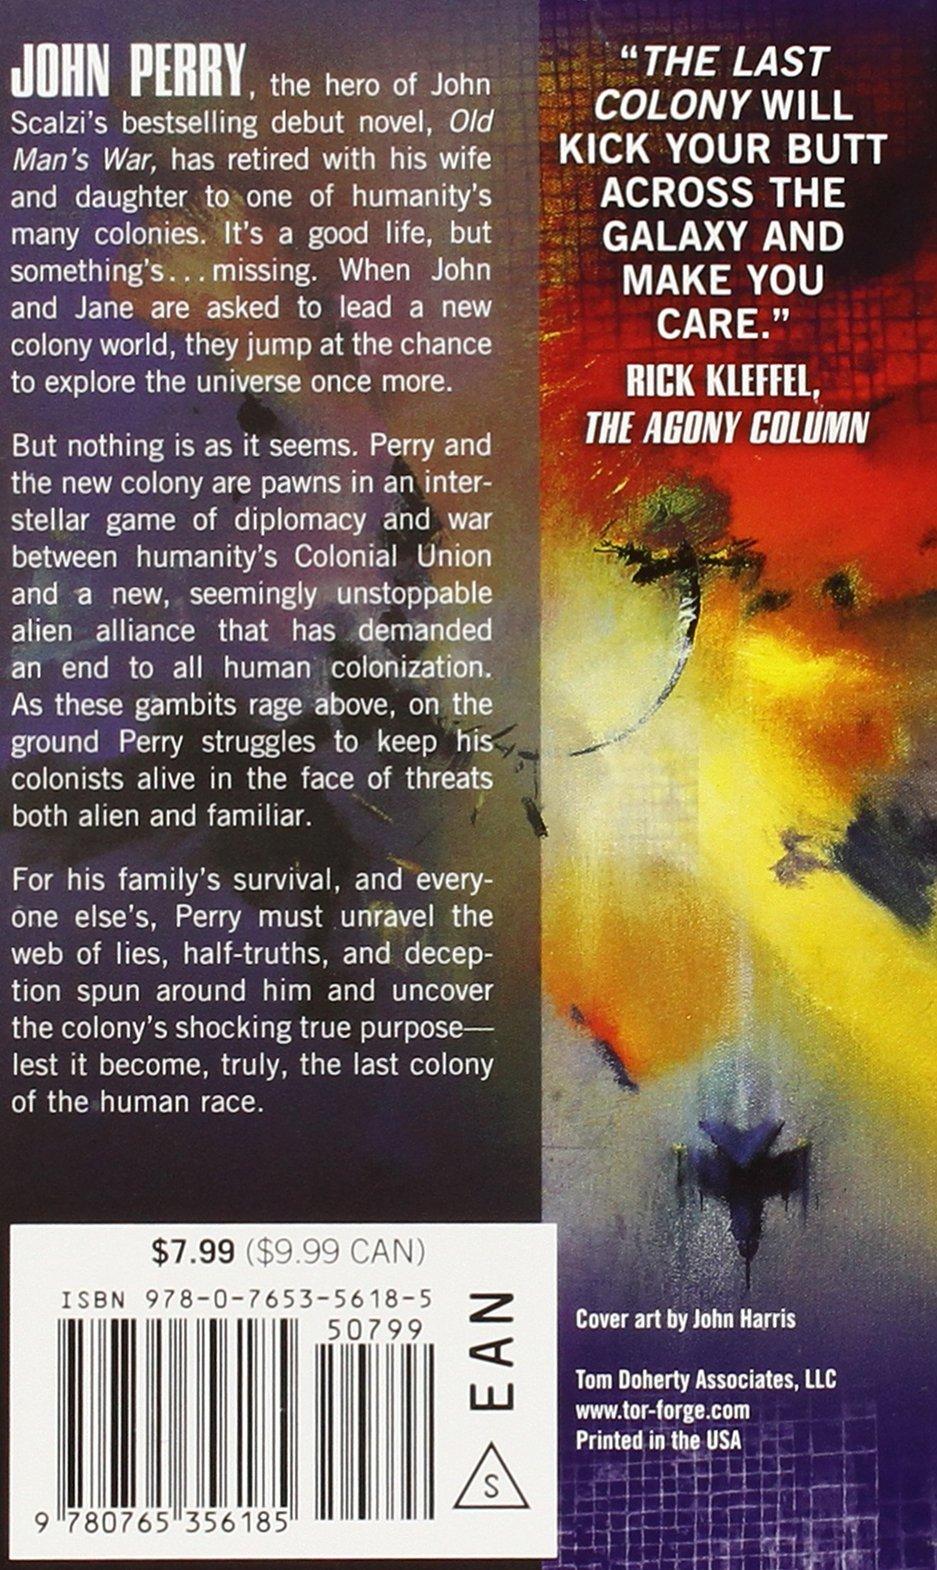 The Last Colony (Old Man's War): John Scalzi: 9780765356185: Amazon.com:  Books